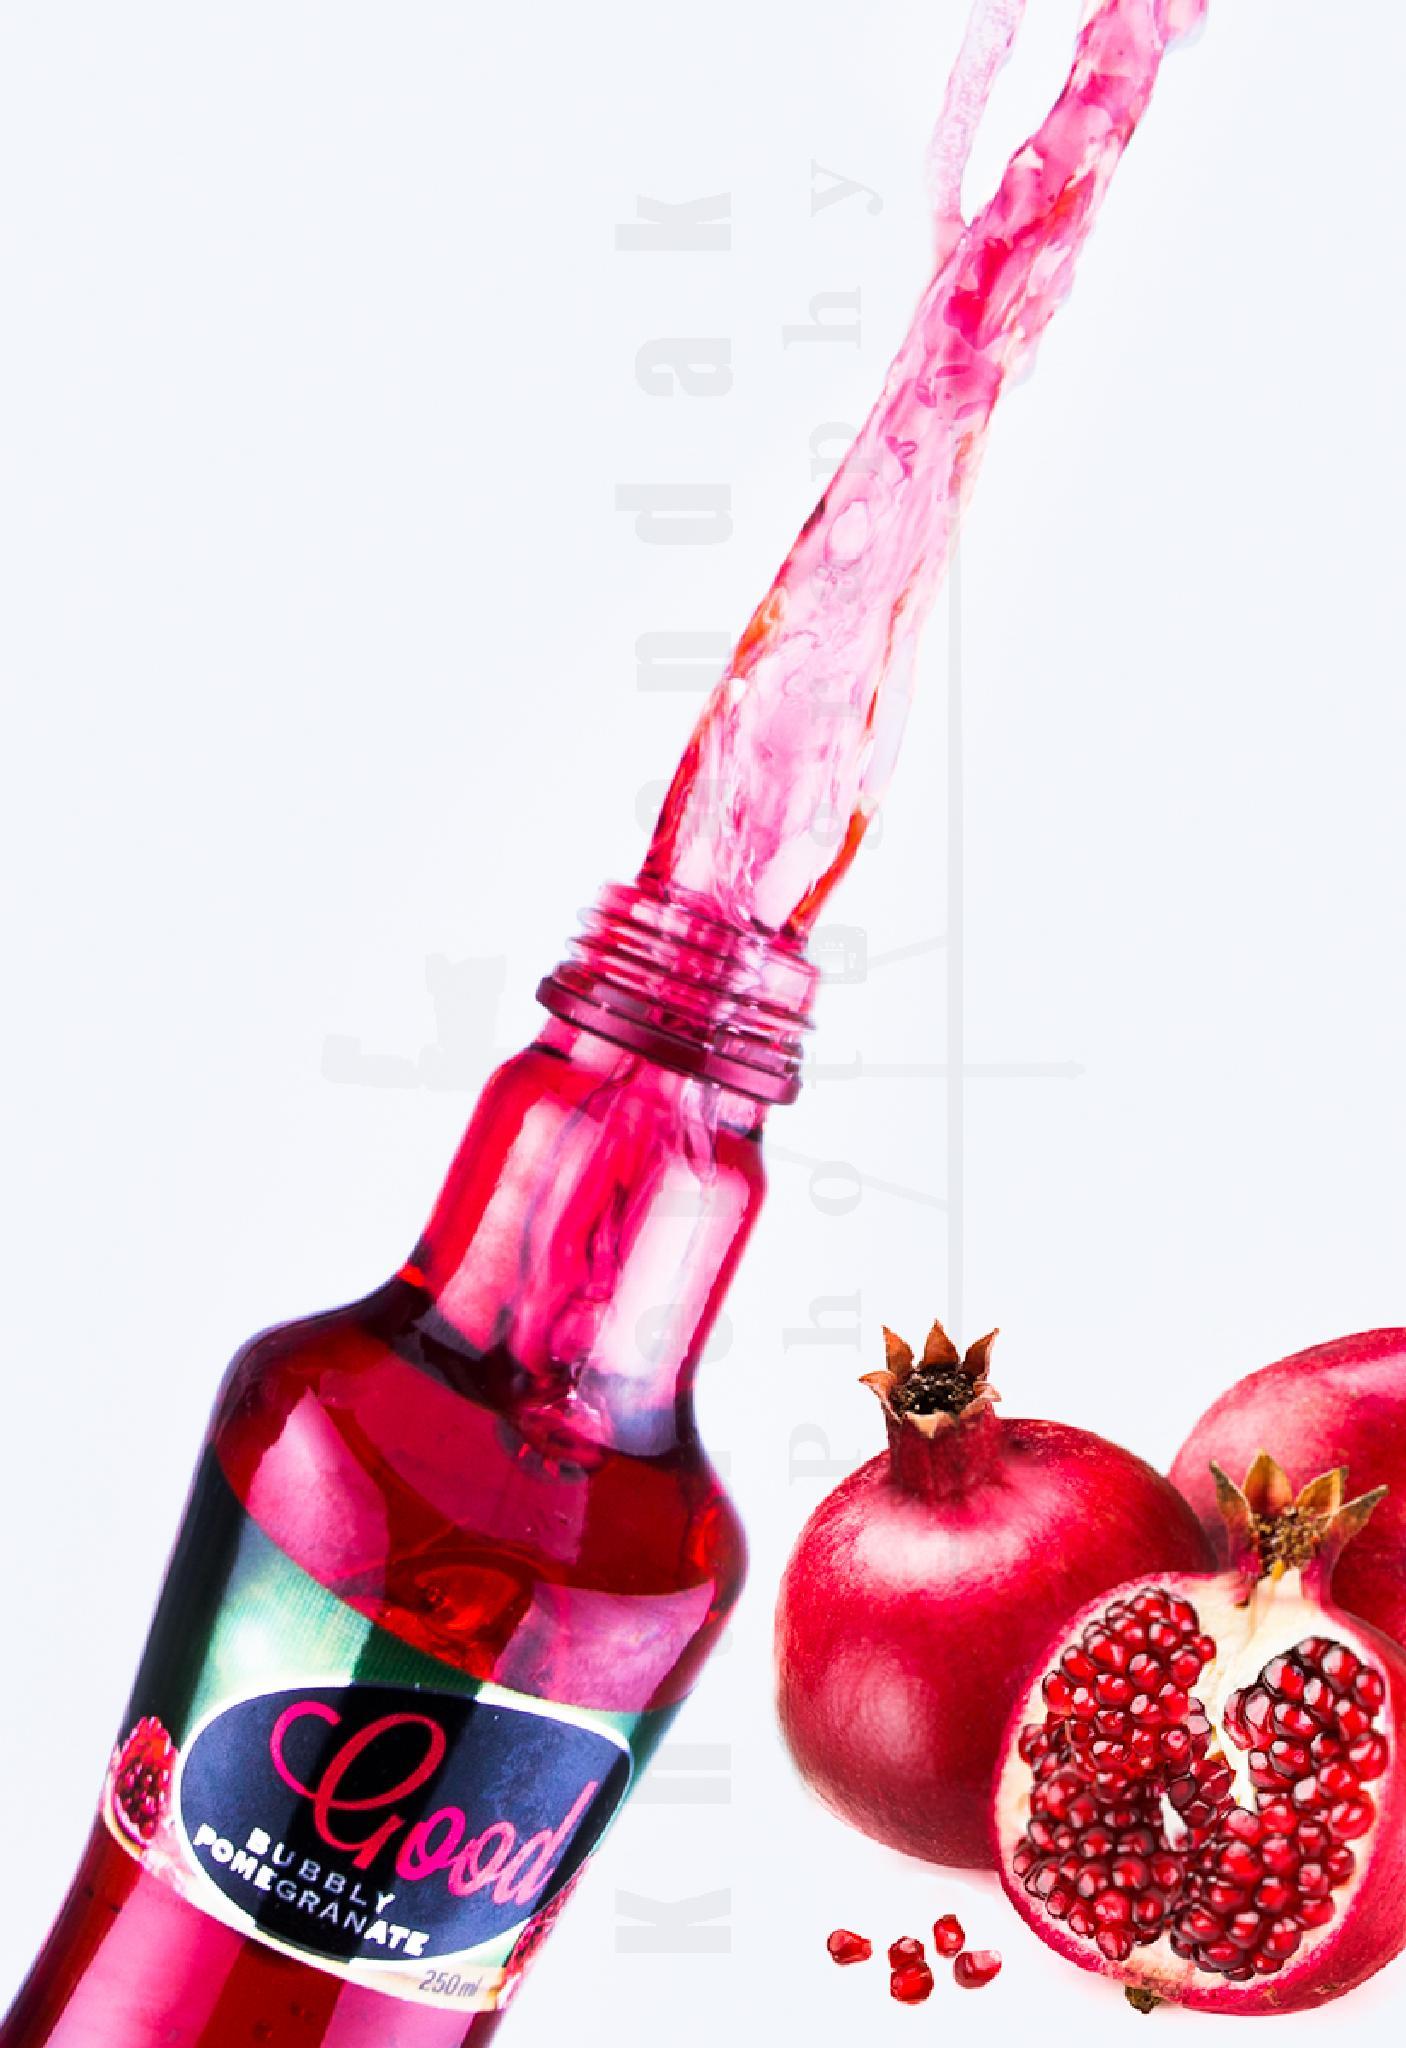 Pomegranate Drink by Khader Bandak